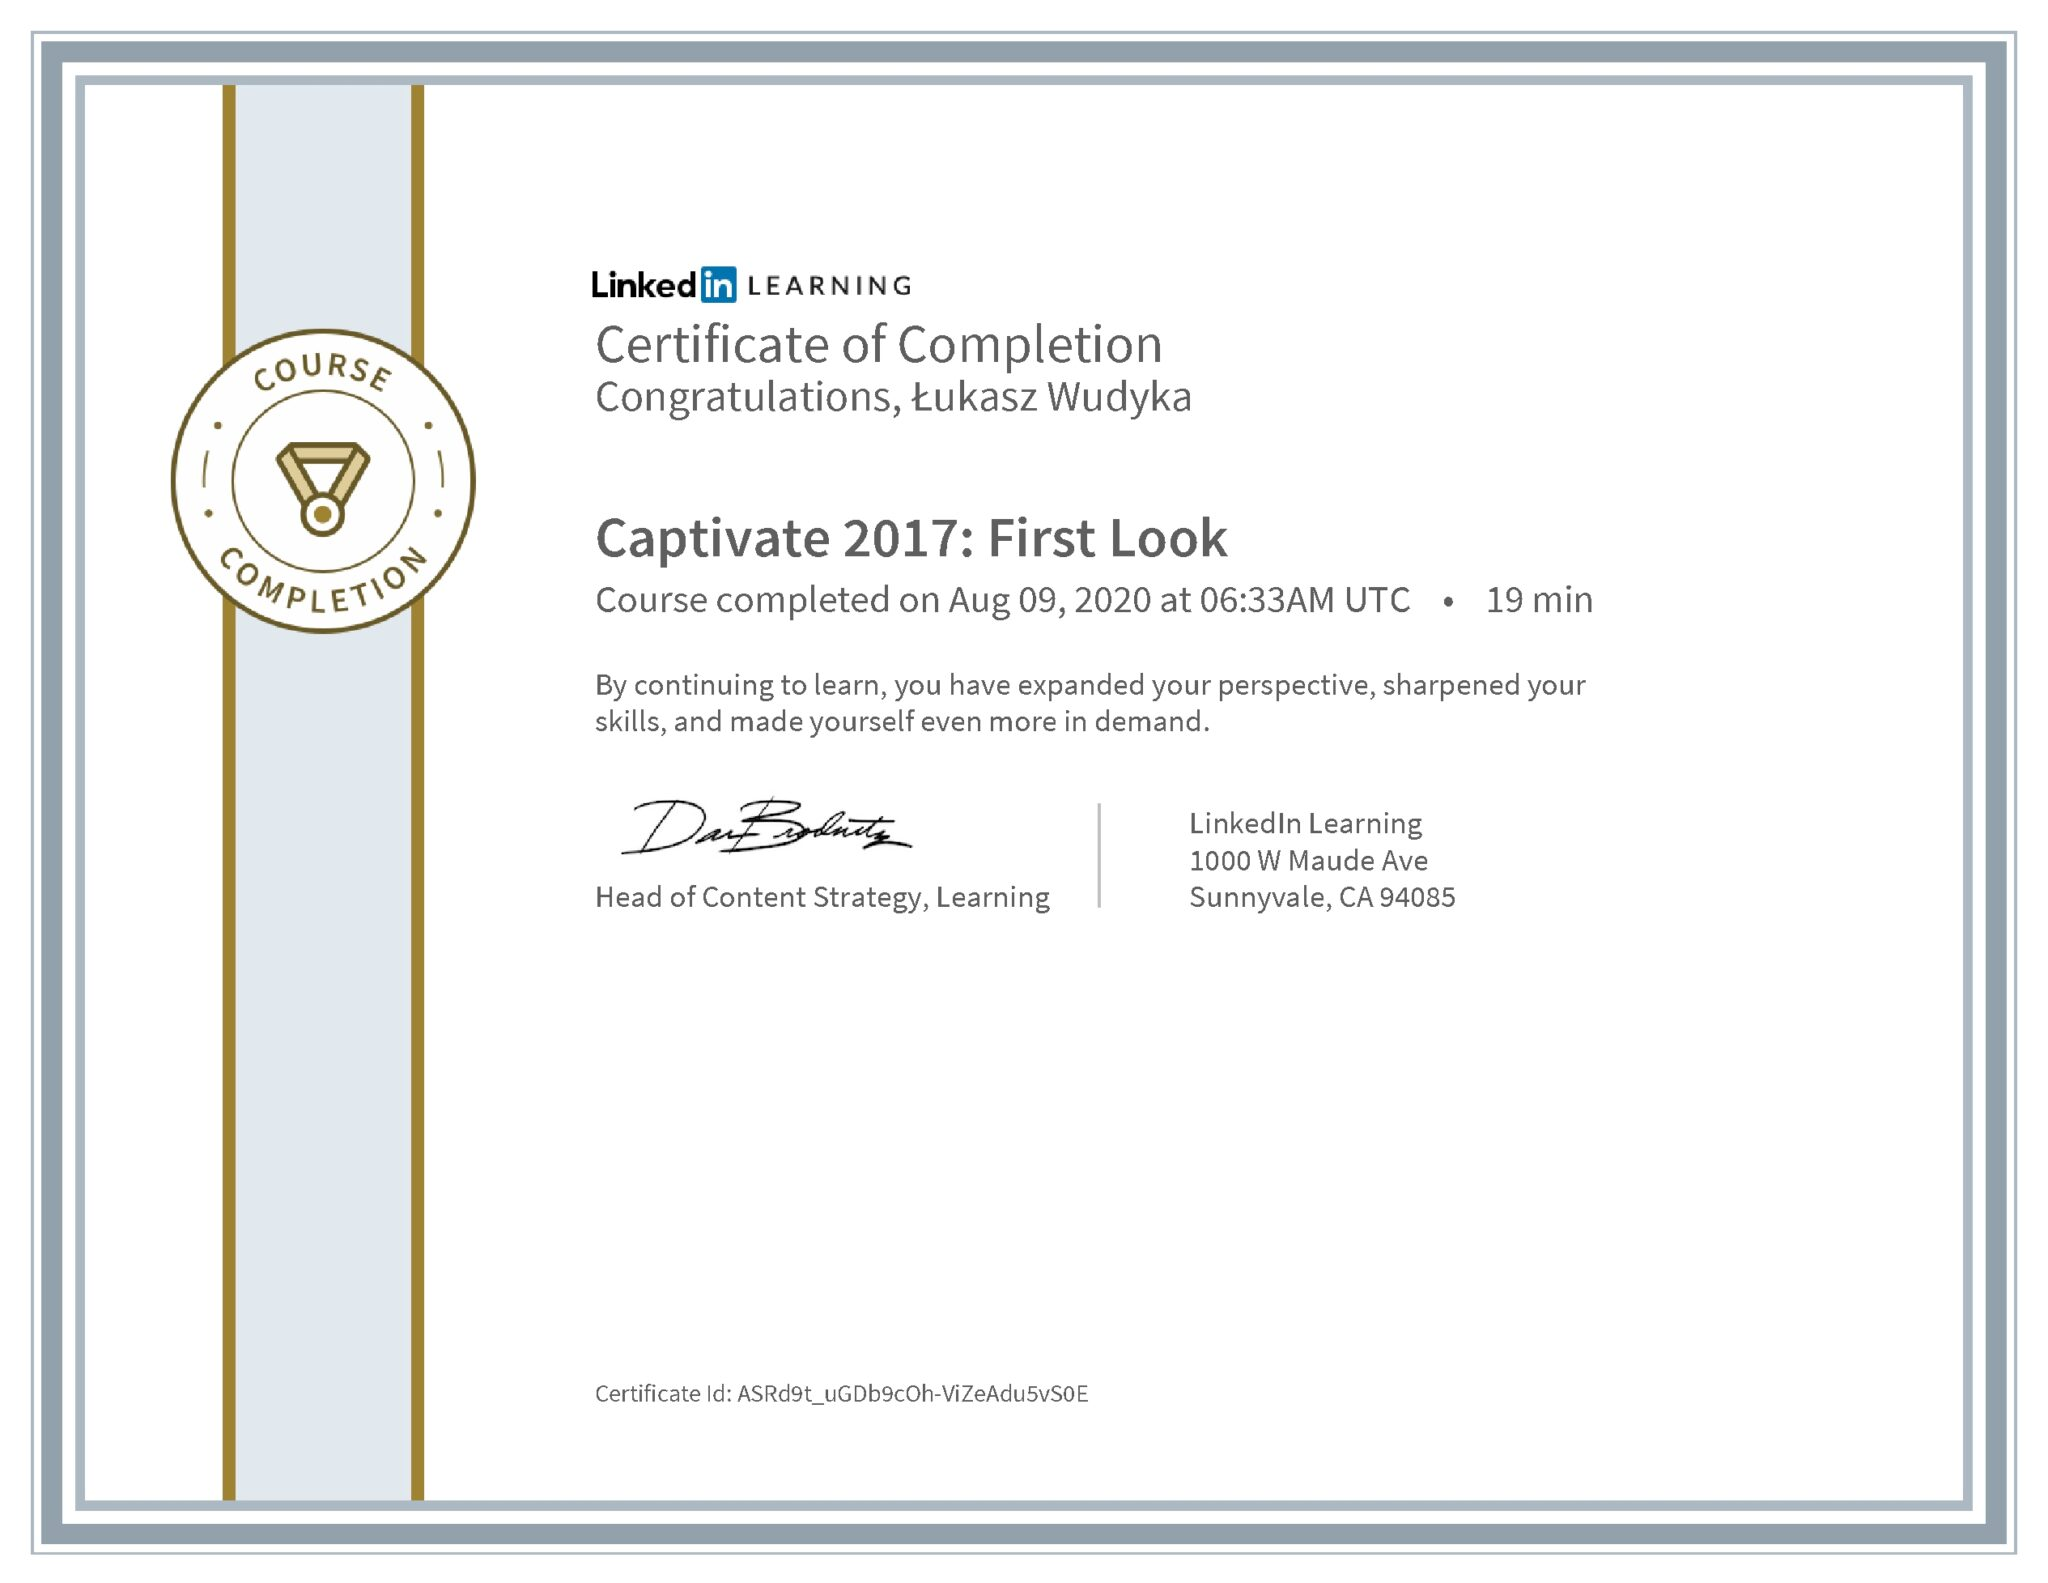 Łukasz Wudyka certyfikat LinkedIn Captivate 2017: First Look